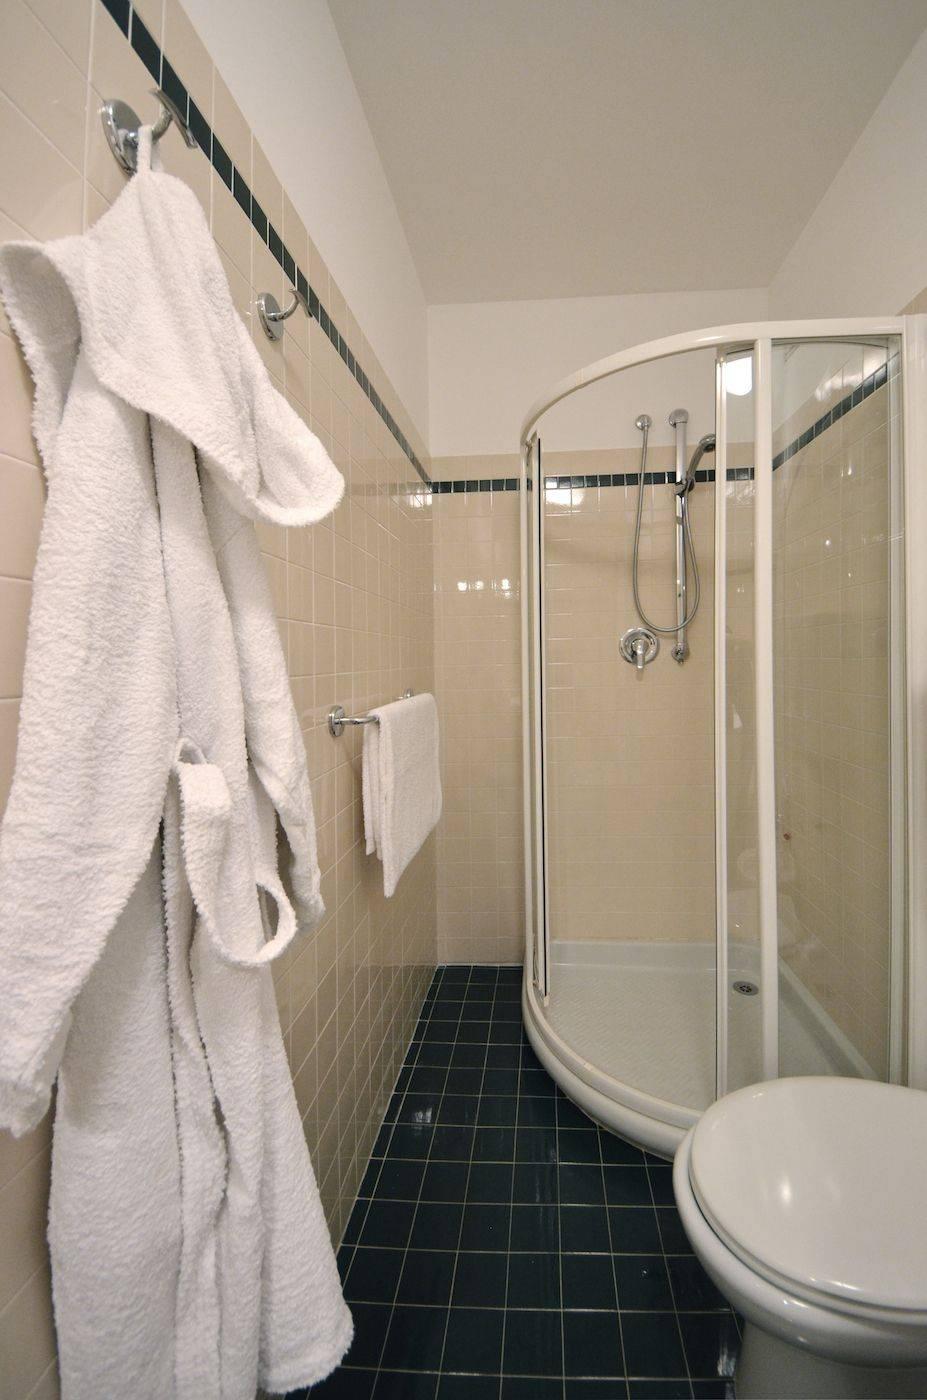 the en-suite bathroom of the second bedroom has a shower cabin